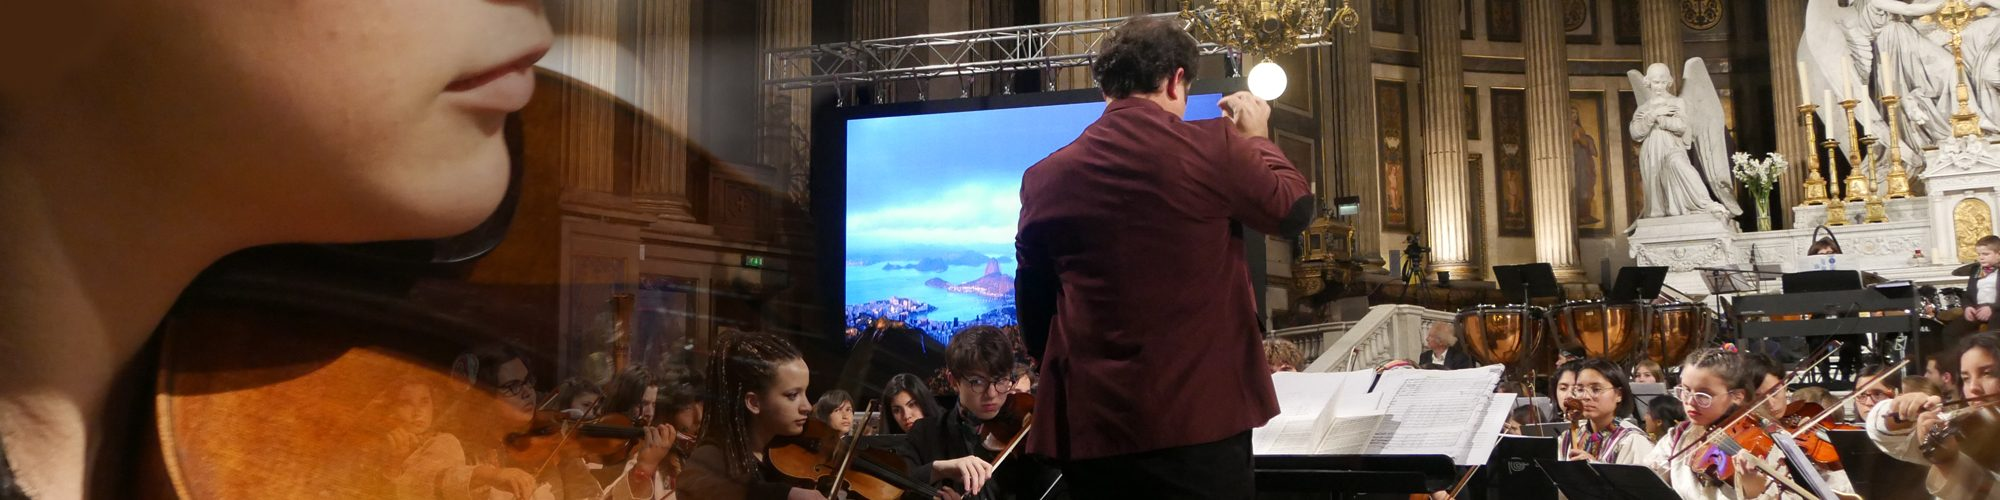 pantalla-gigante-led-supervision-concierto-clima-madeleine-m5.8